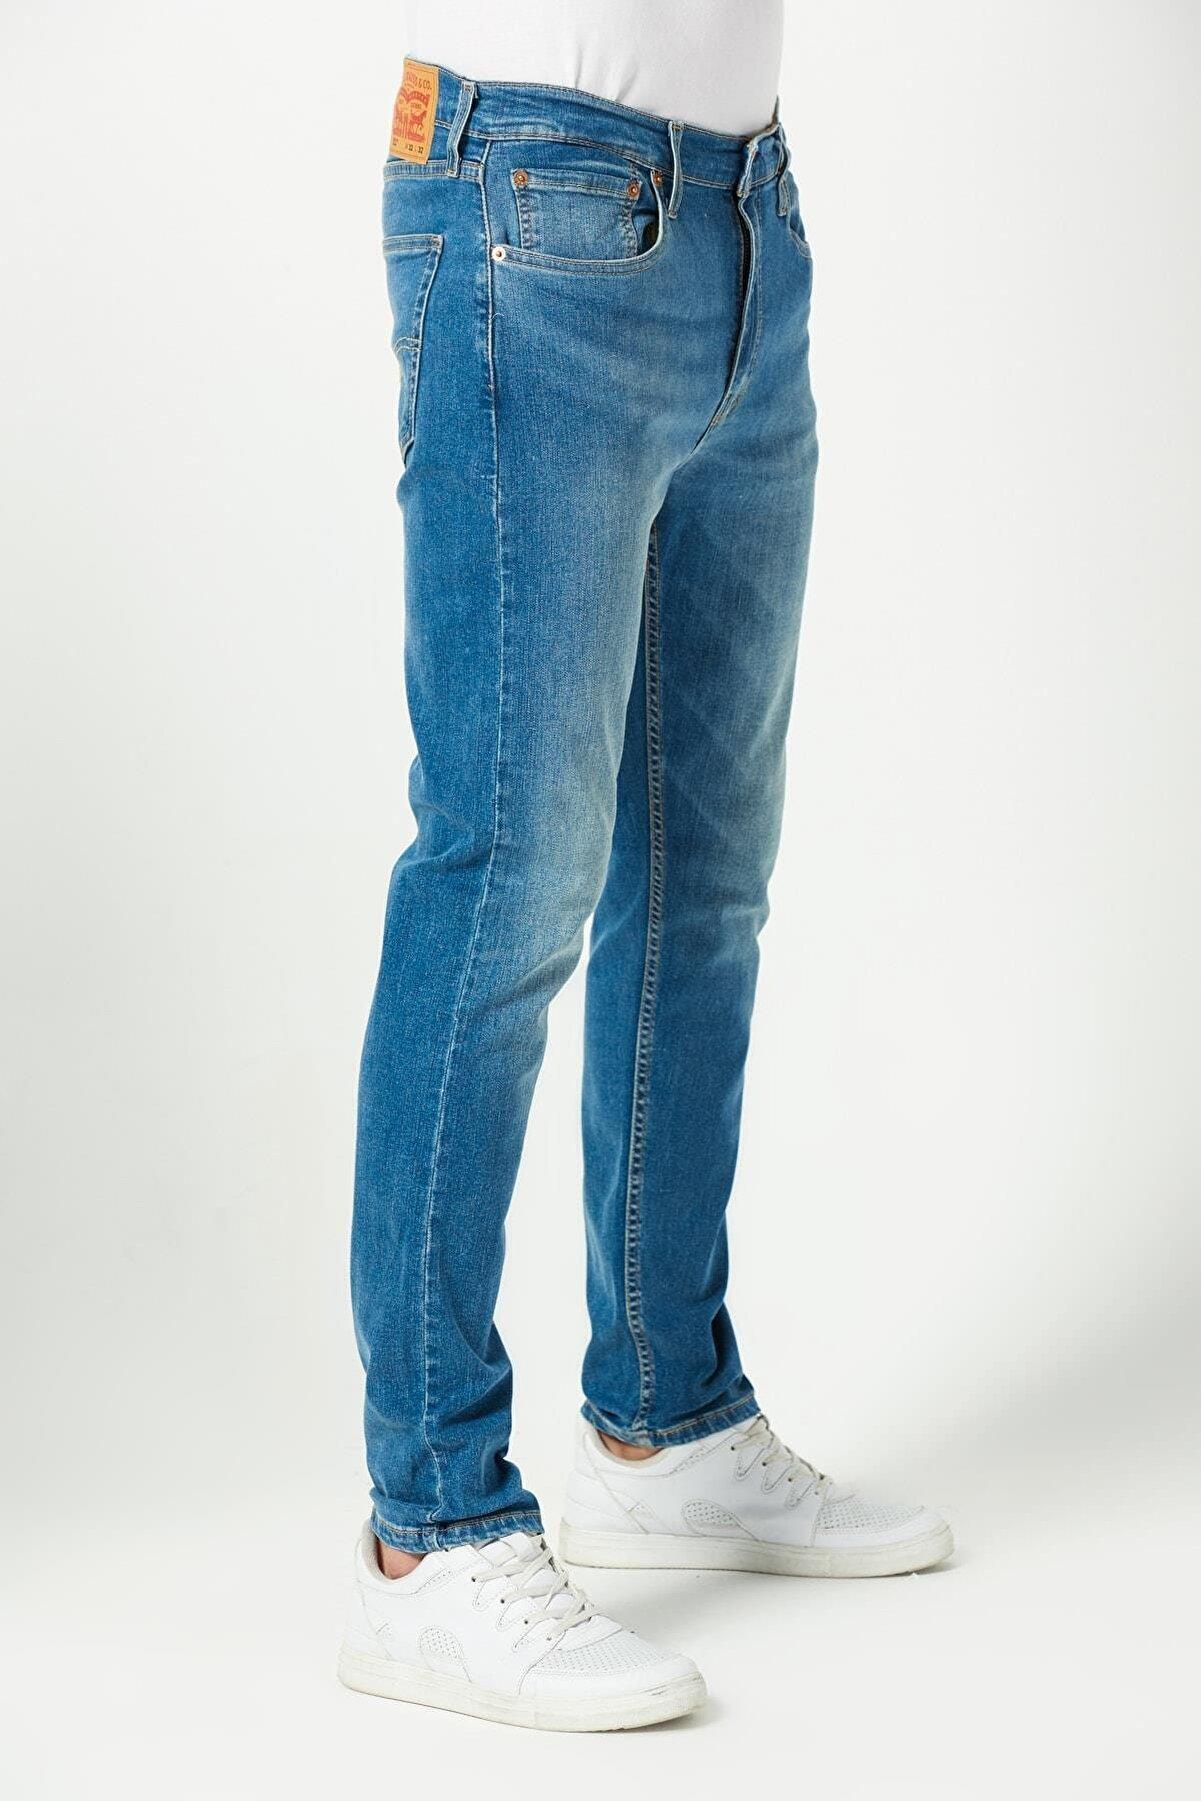 Levi's Erkek Indıgo Slim Taper Jean 28833-0513